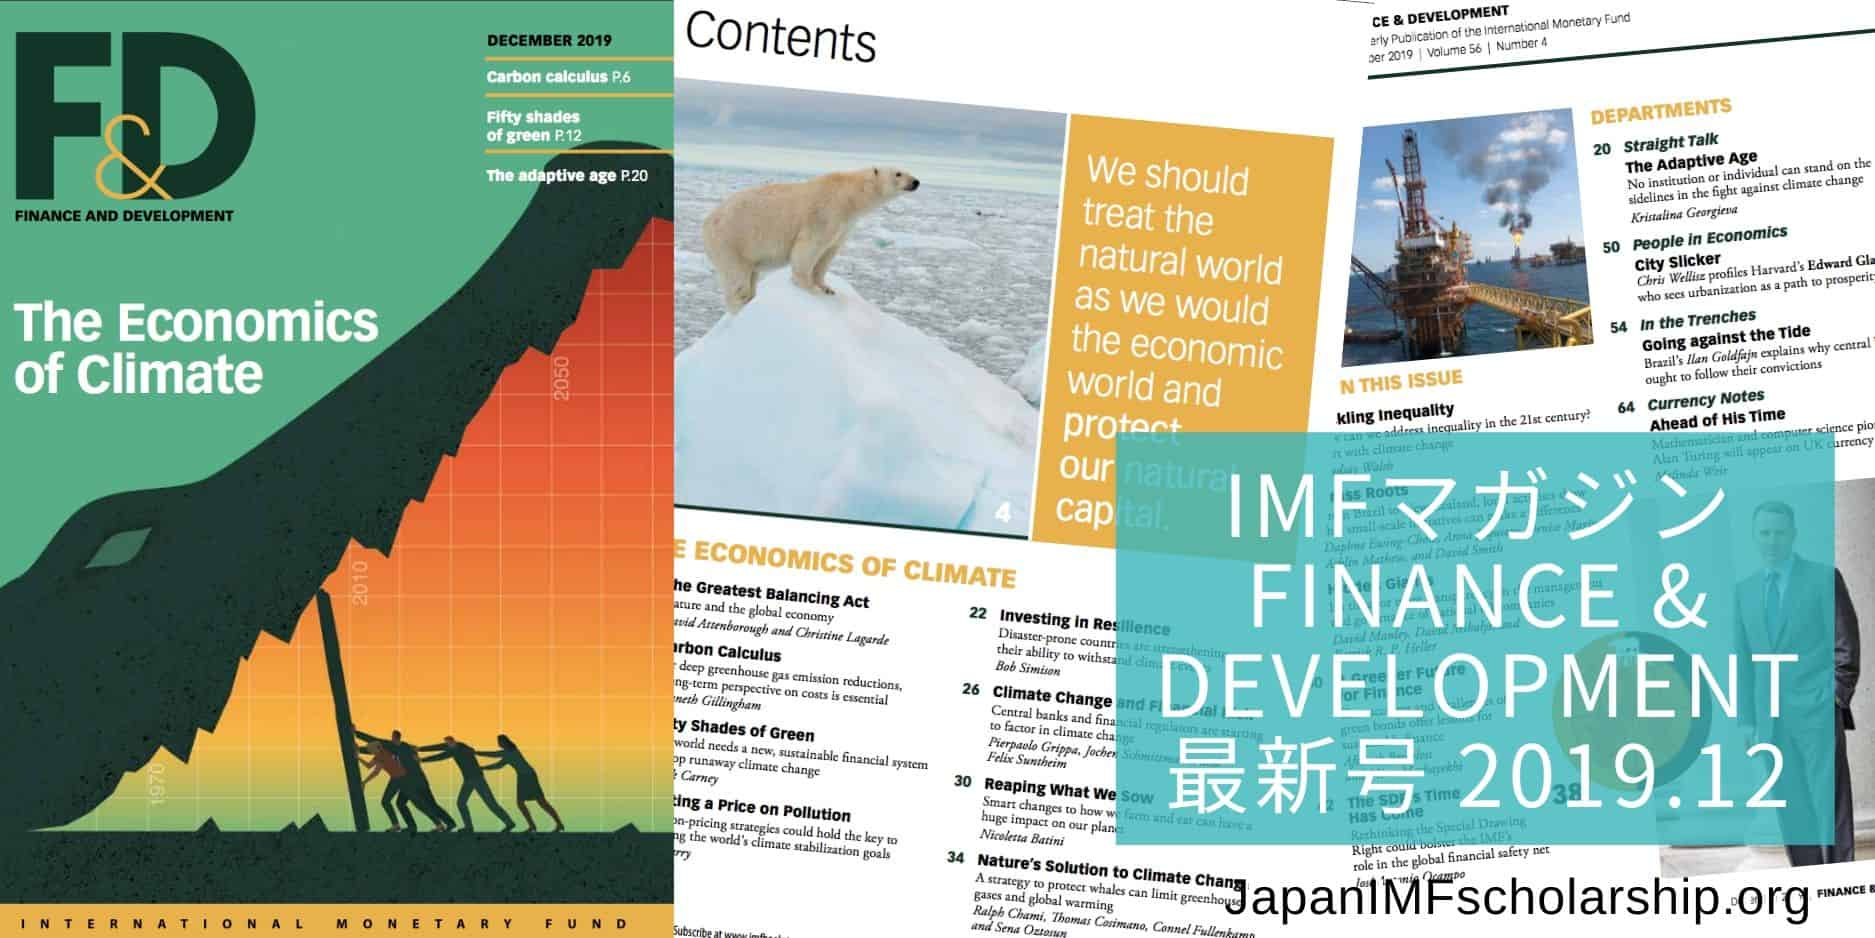 jisp web-fb imf magazine finance and development dec 2019